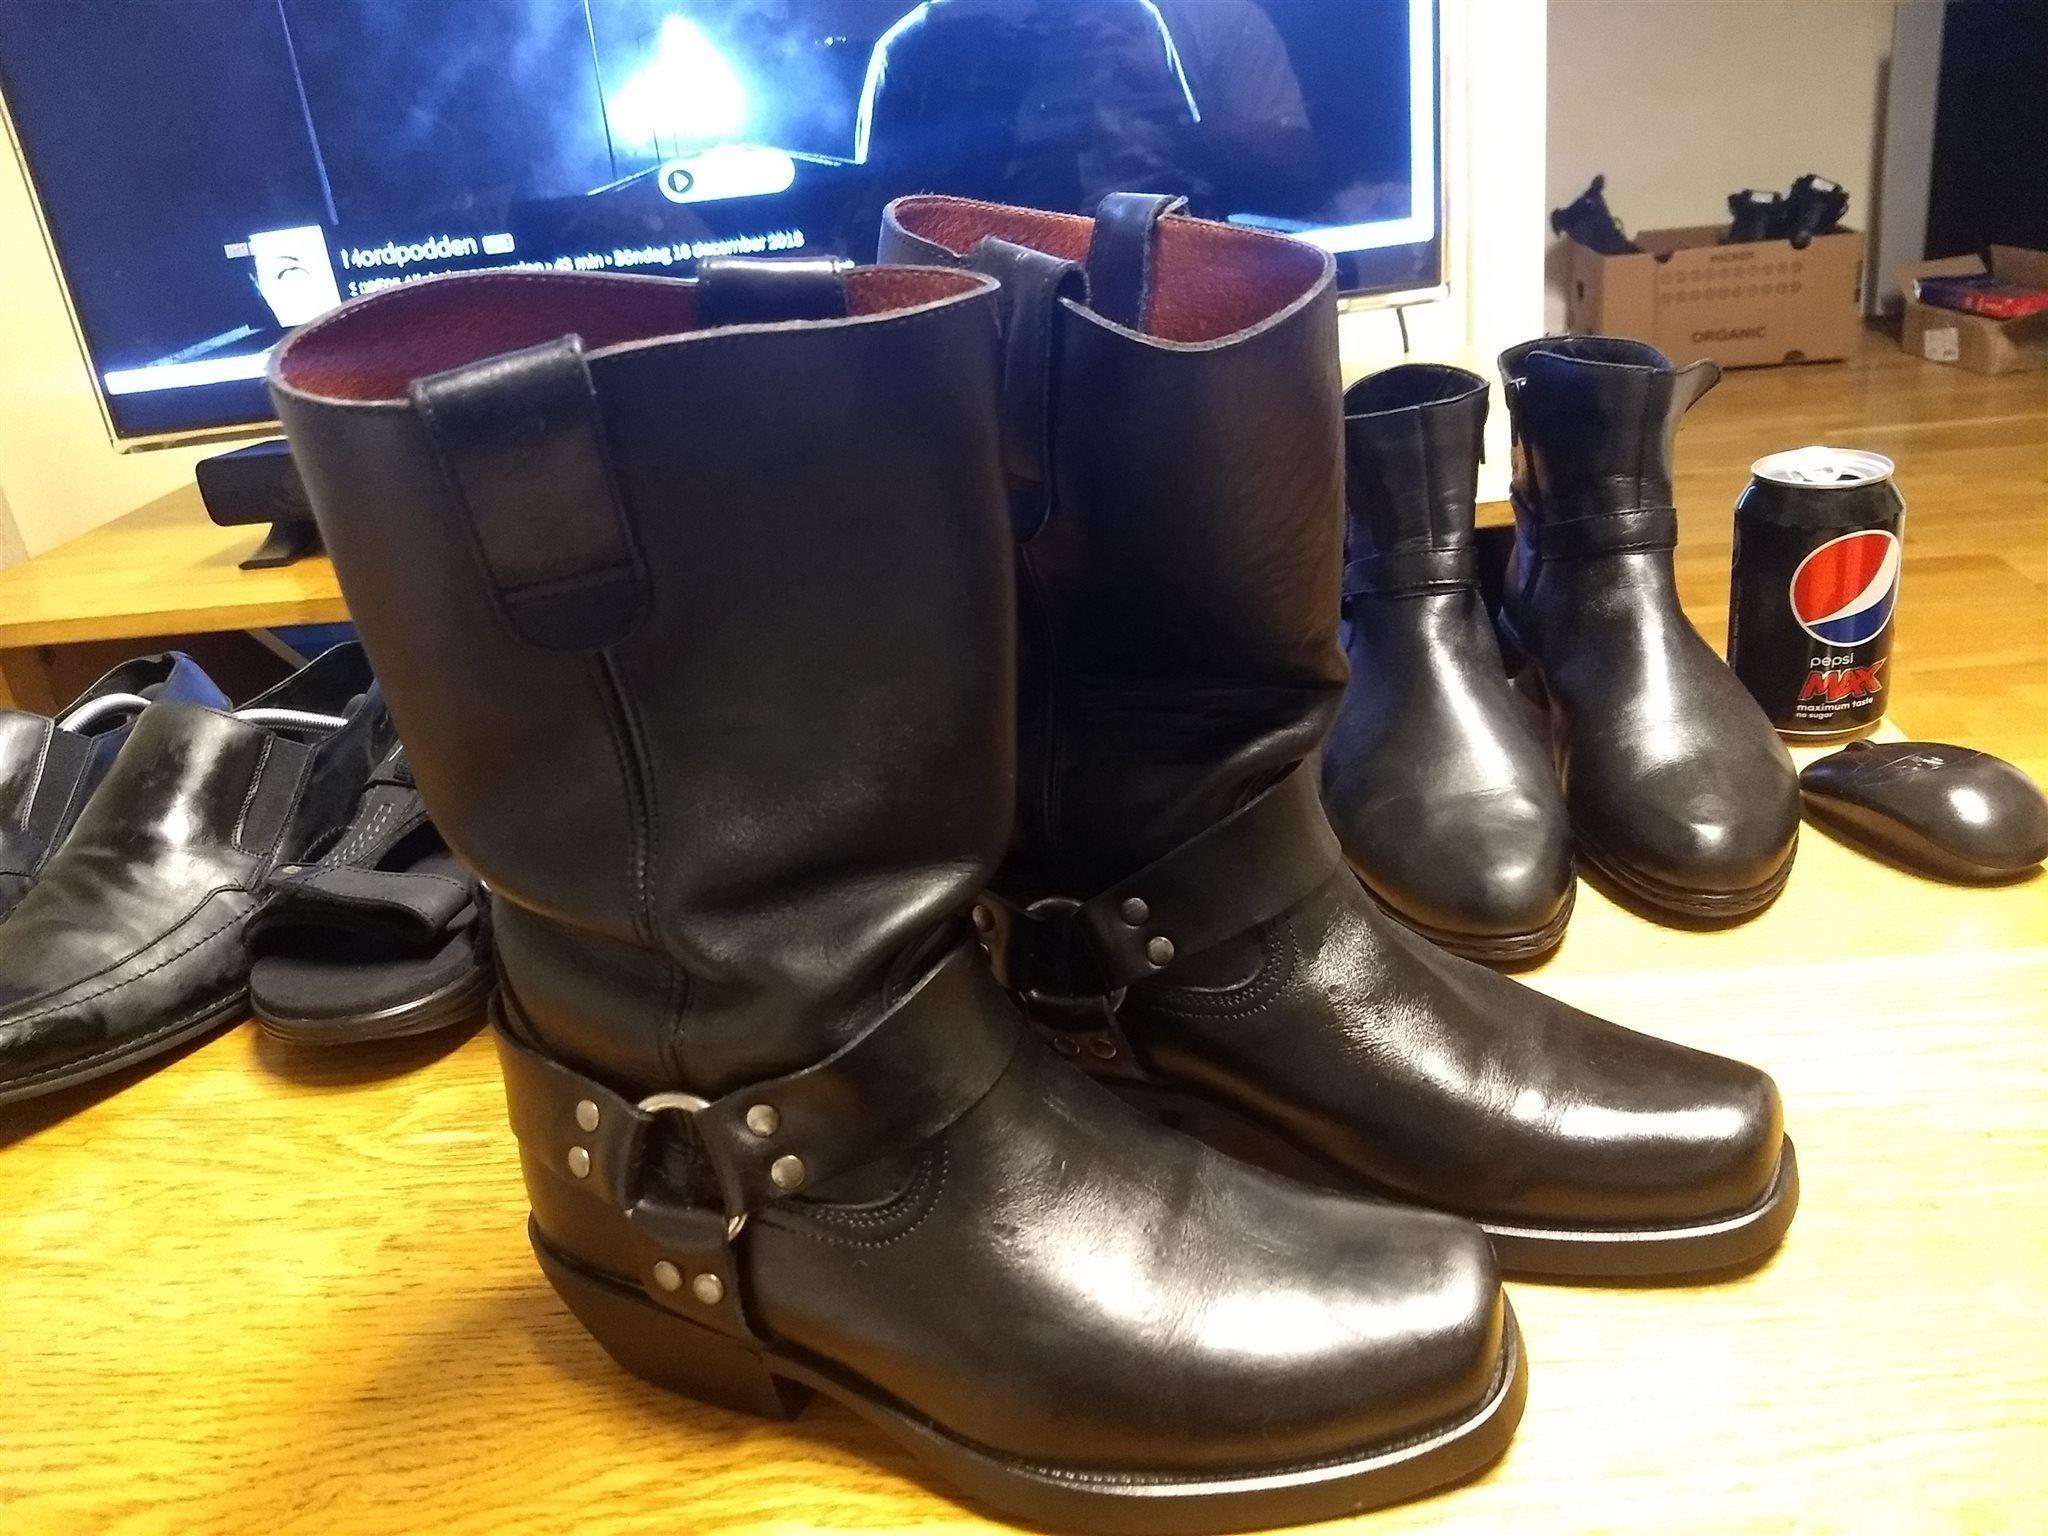 Svarta Falco biker cowboy boots vintage mc punk rock metal skinn l?der 38